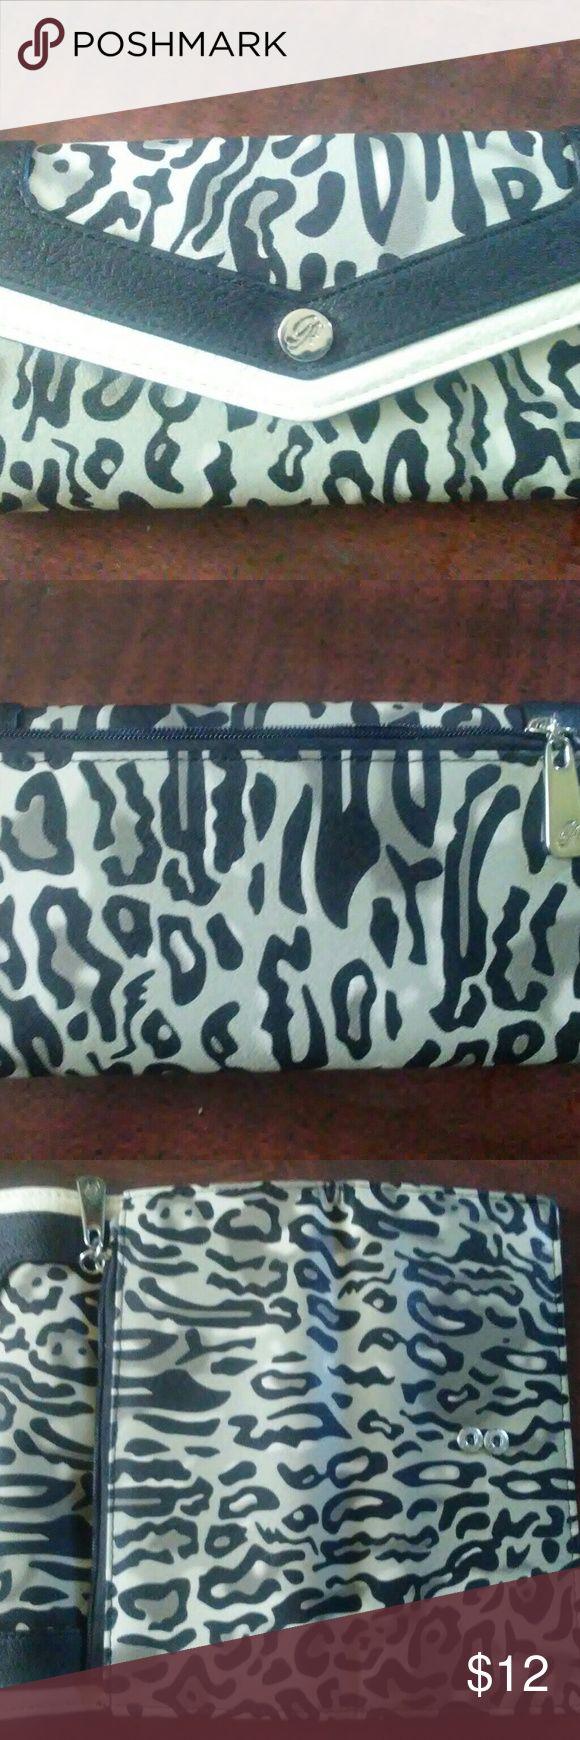 NWOT.   Grace Adele wallet animal print ! 10 Slots for cards outside zip pocket.  OBRO Grace Adele Bags Wallets